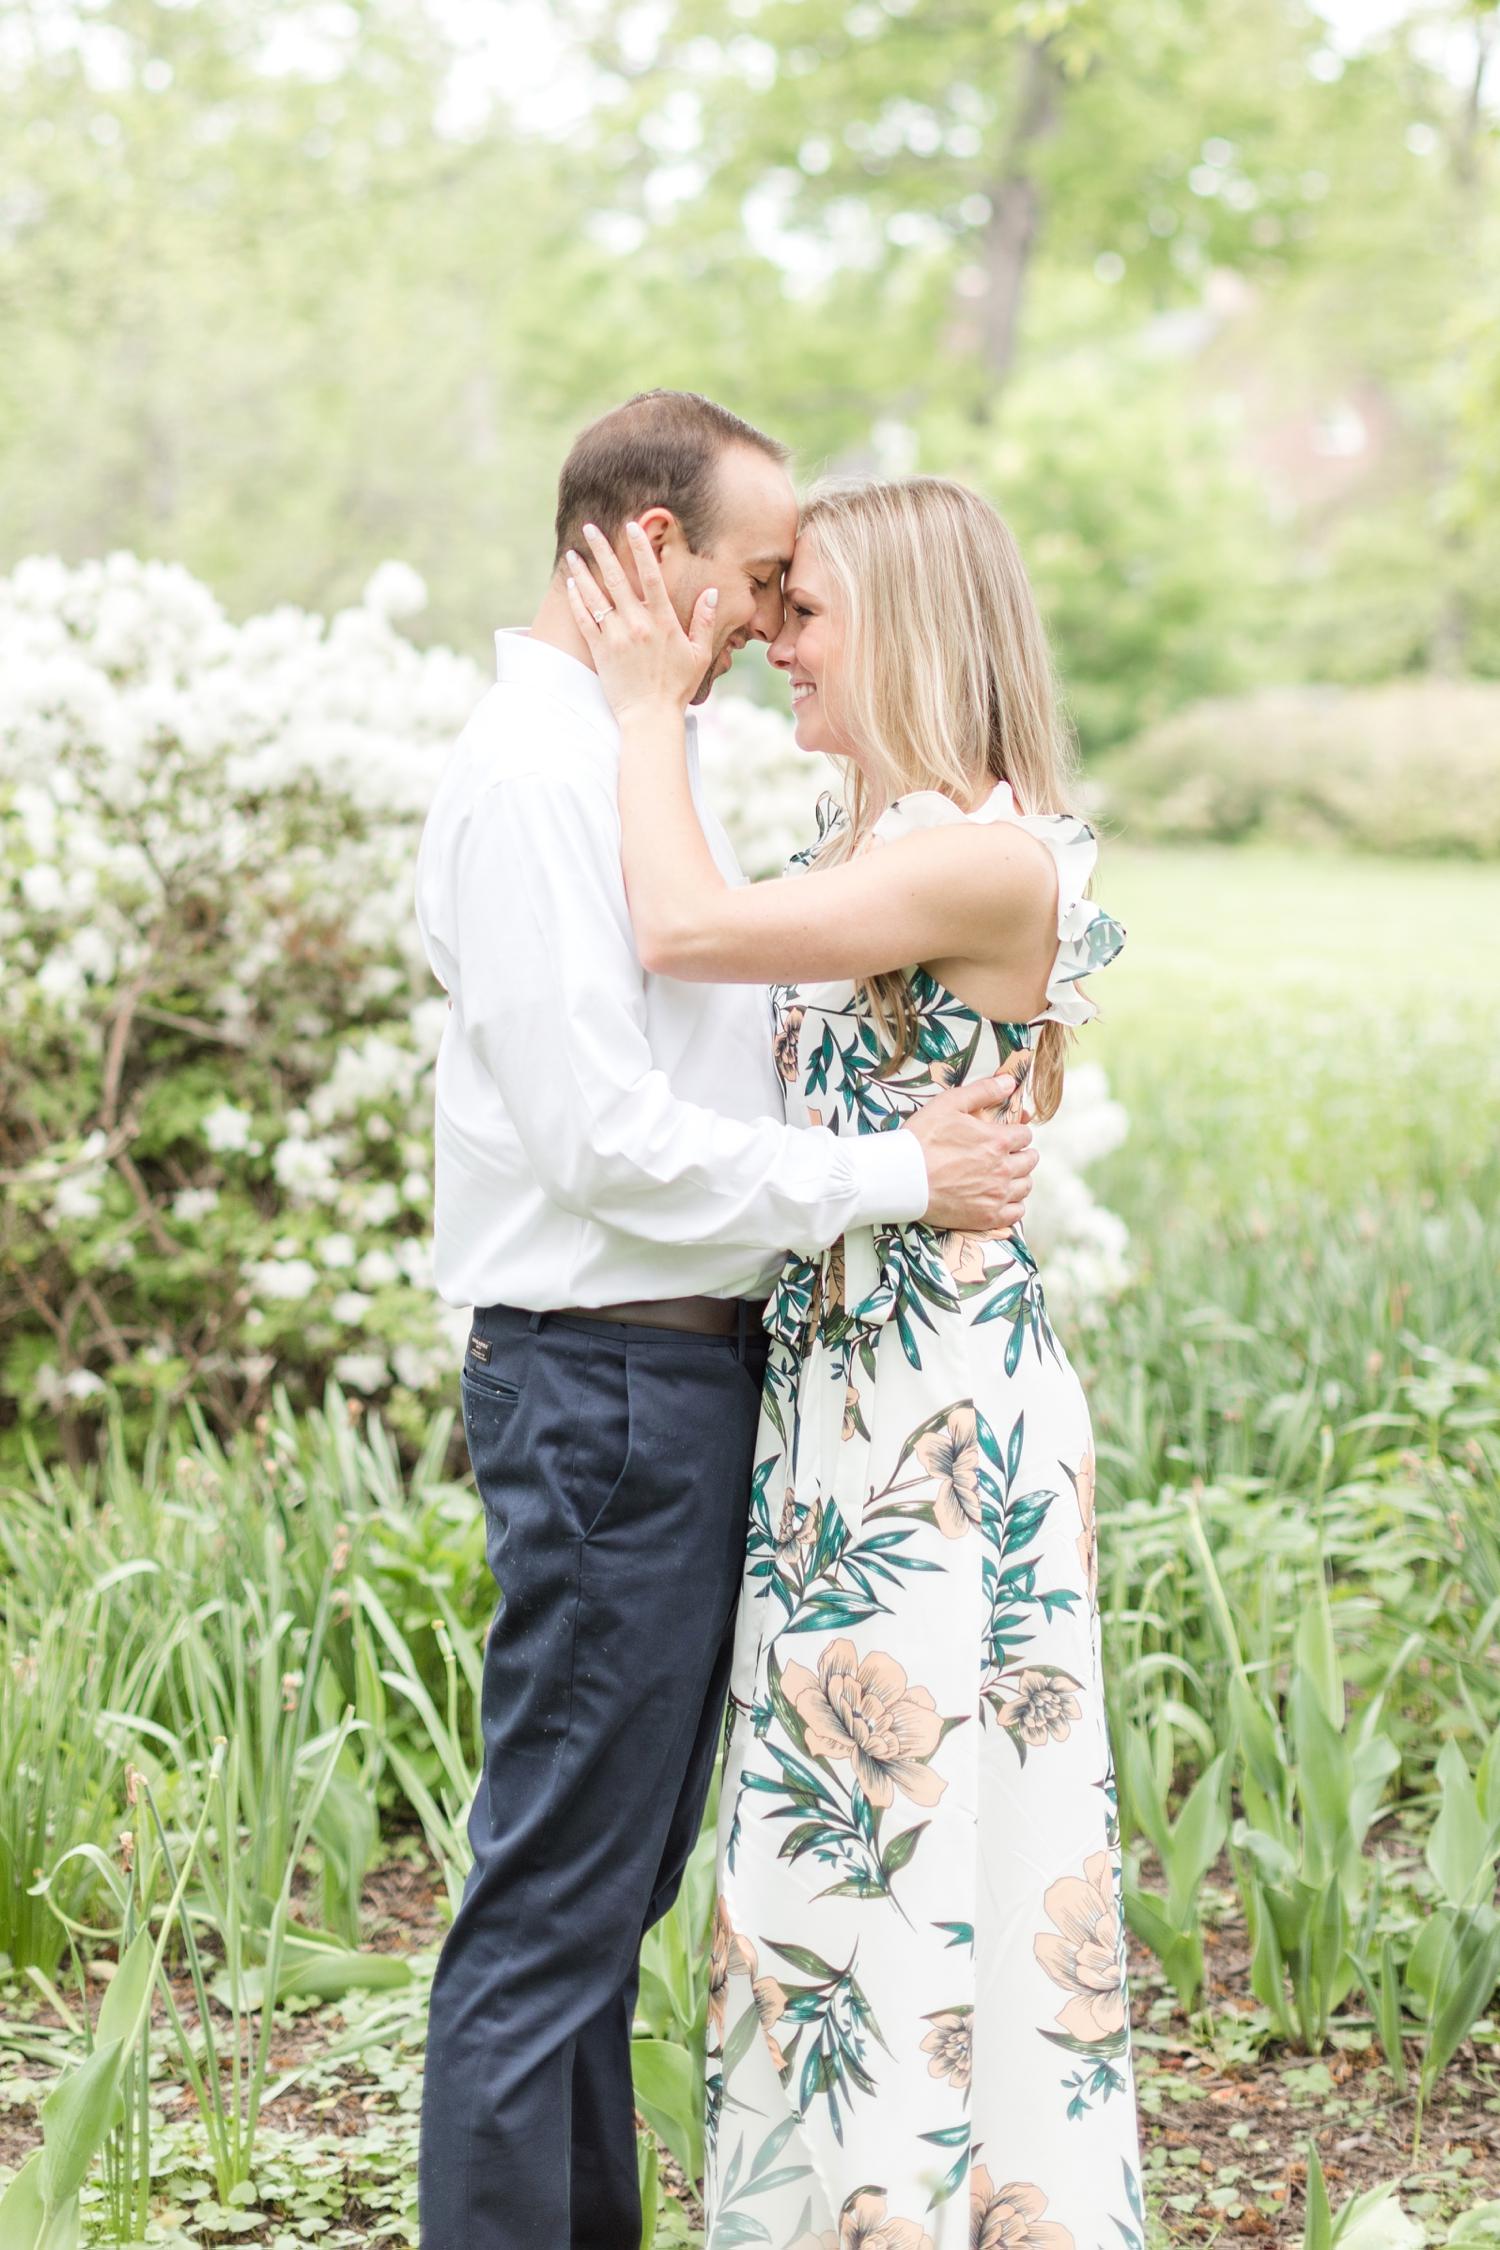 Maddy and Lloyd Engagement-178_Baltimore-Maryland-engagement-photography-Sherwood-Gardens-Maryland-engagement-photographer-anna-grace-photography-photo.jpg